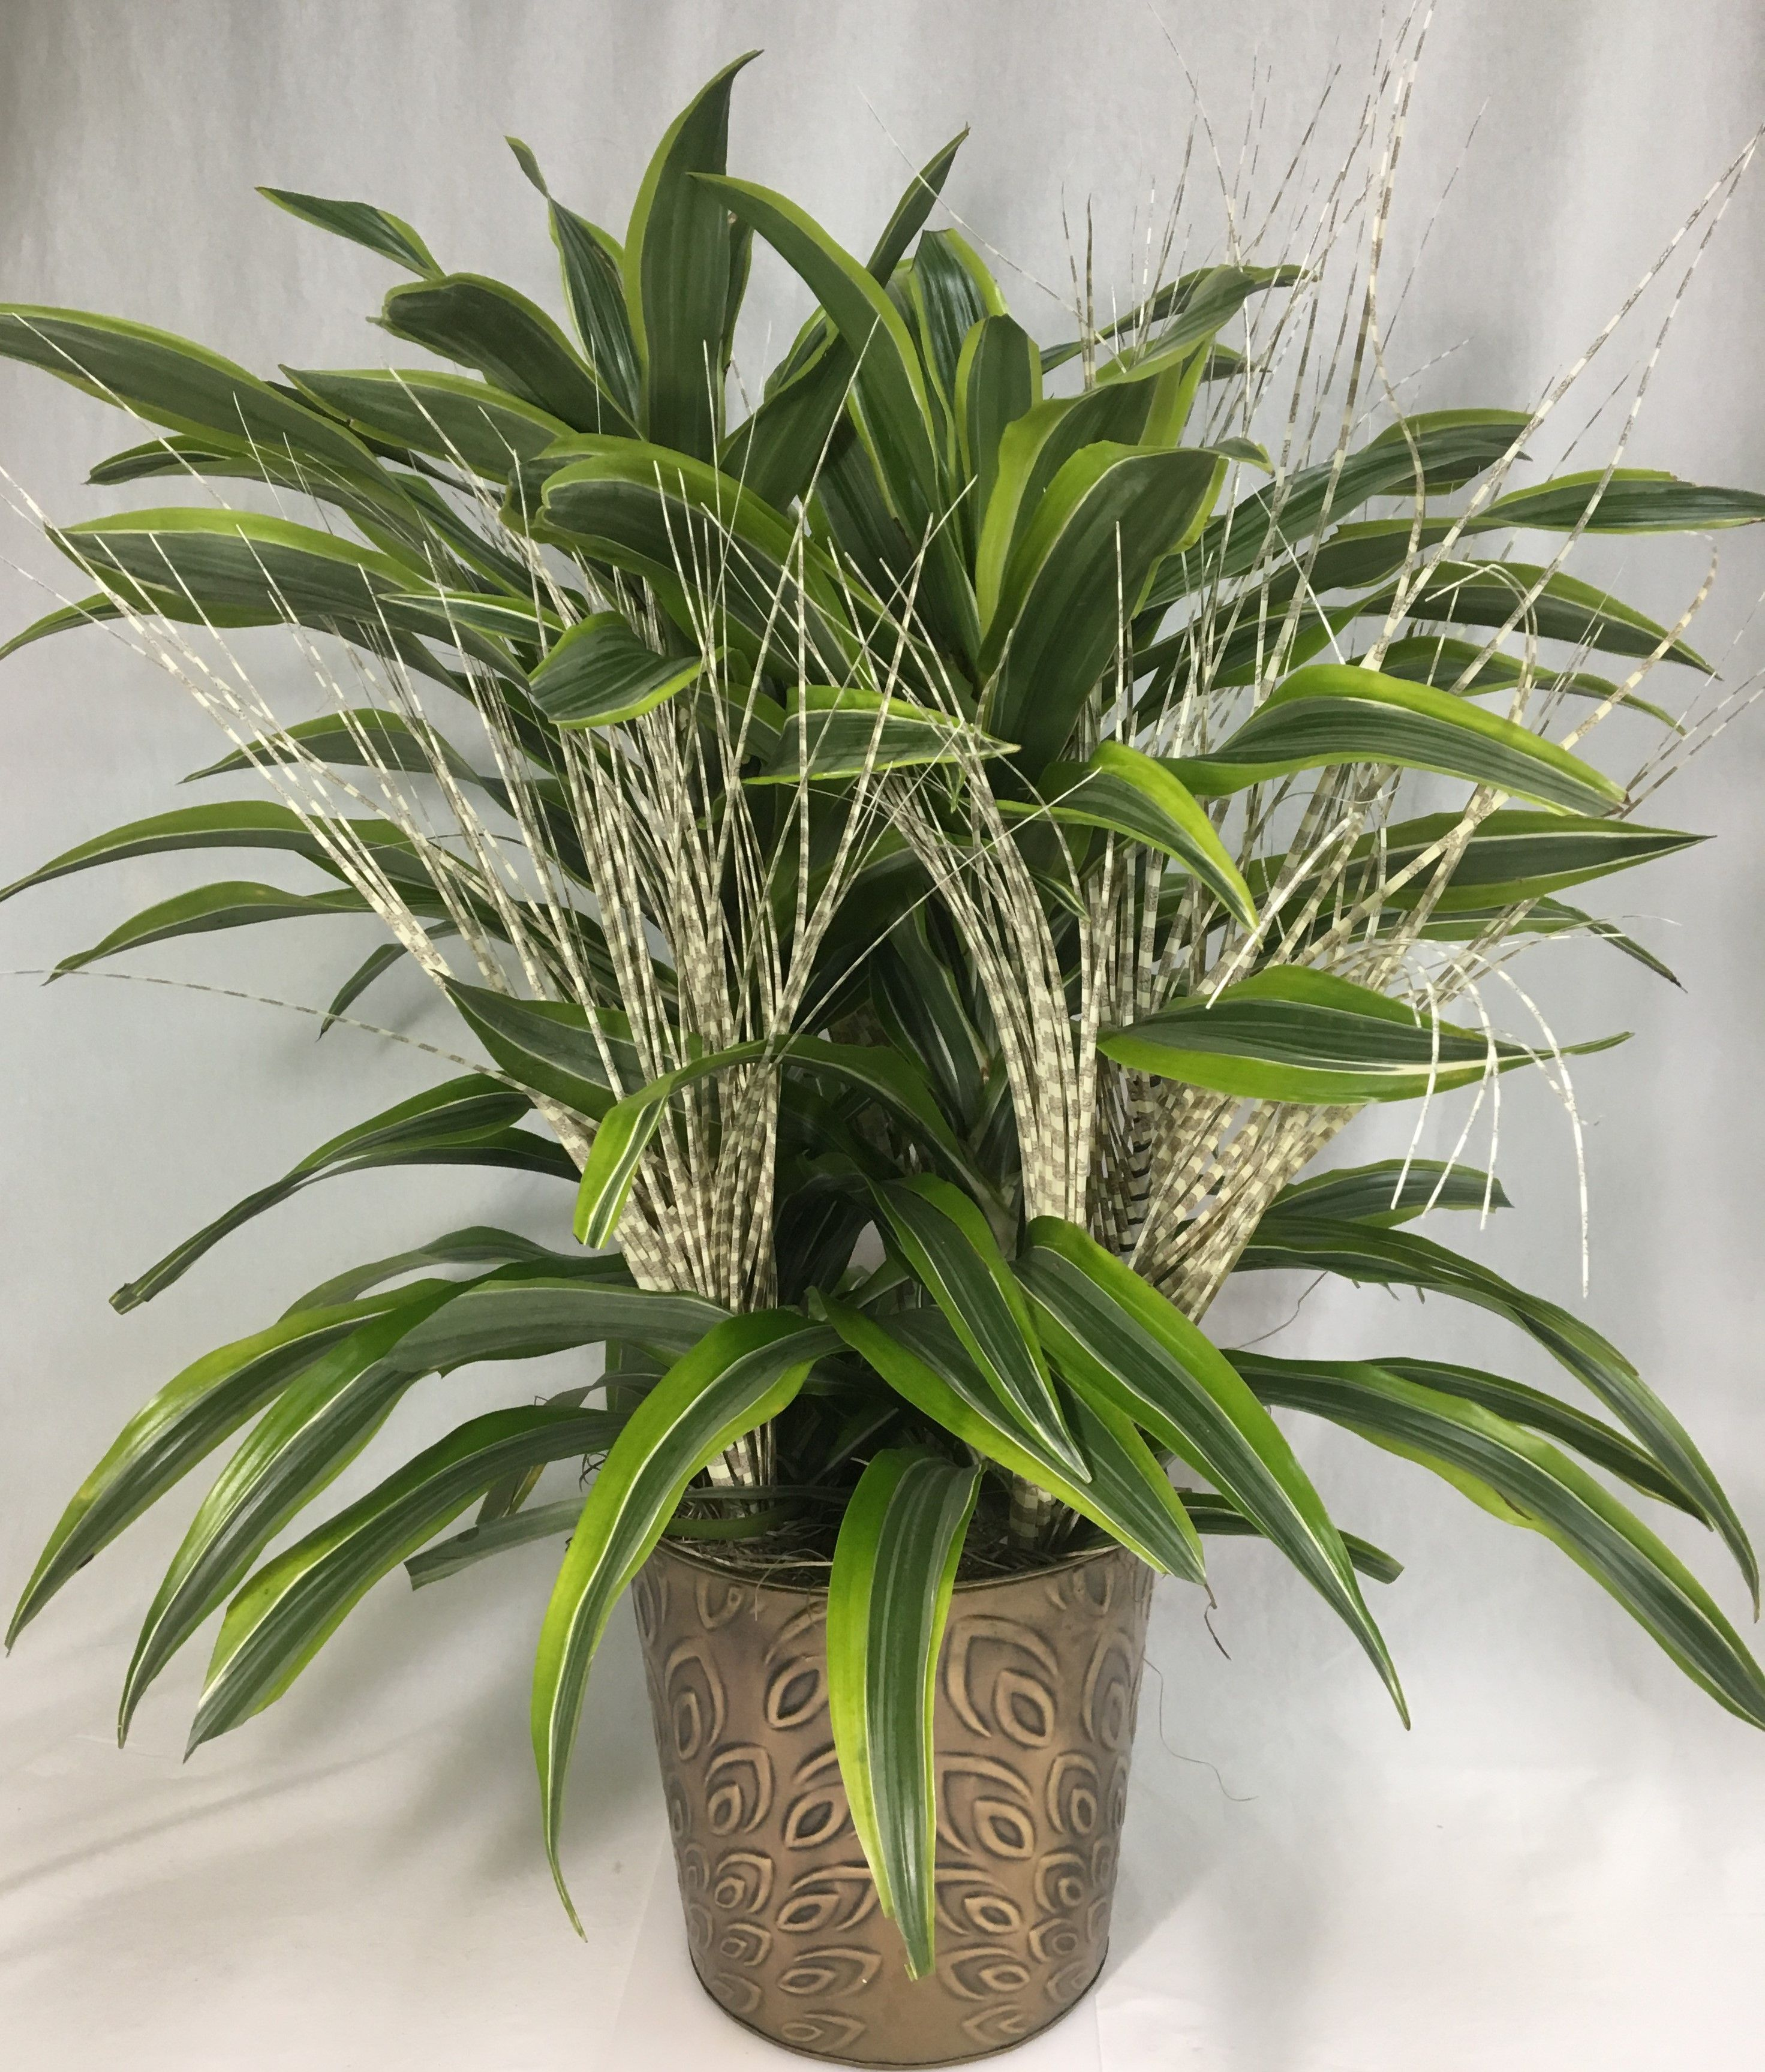 8 dracaena corn plant dressed with artificial zebra grass